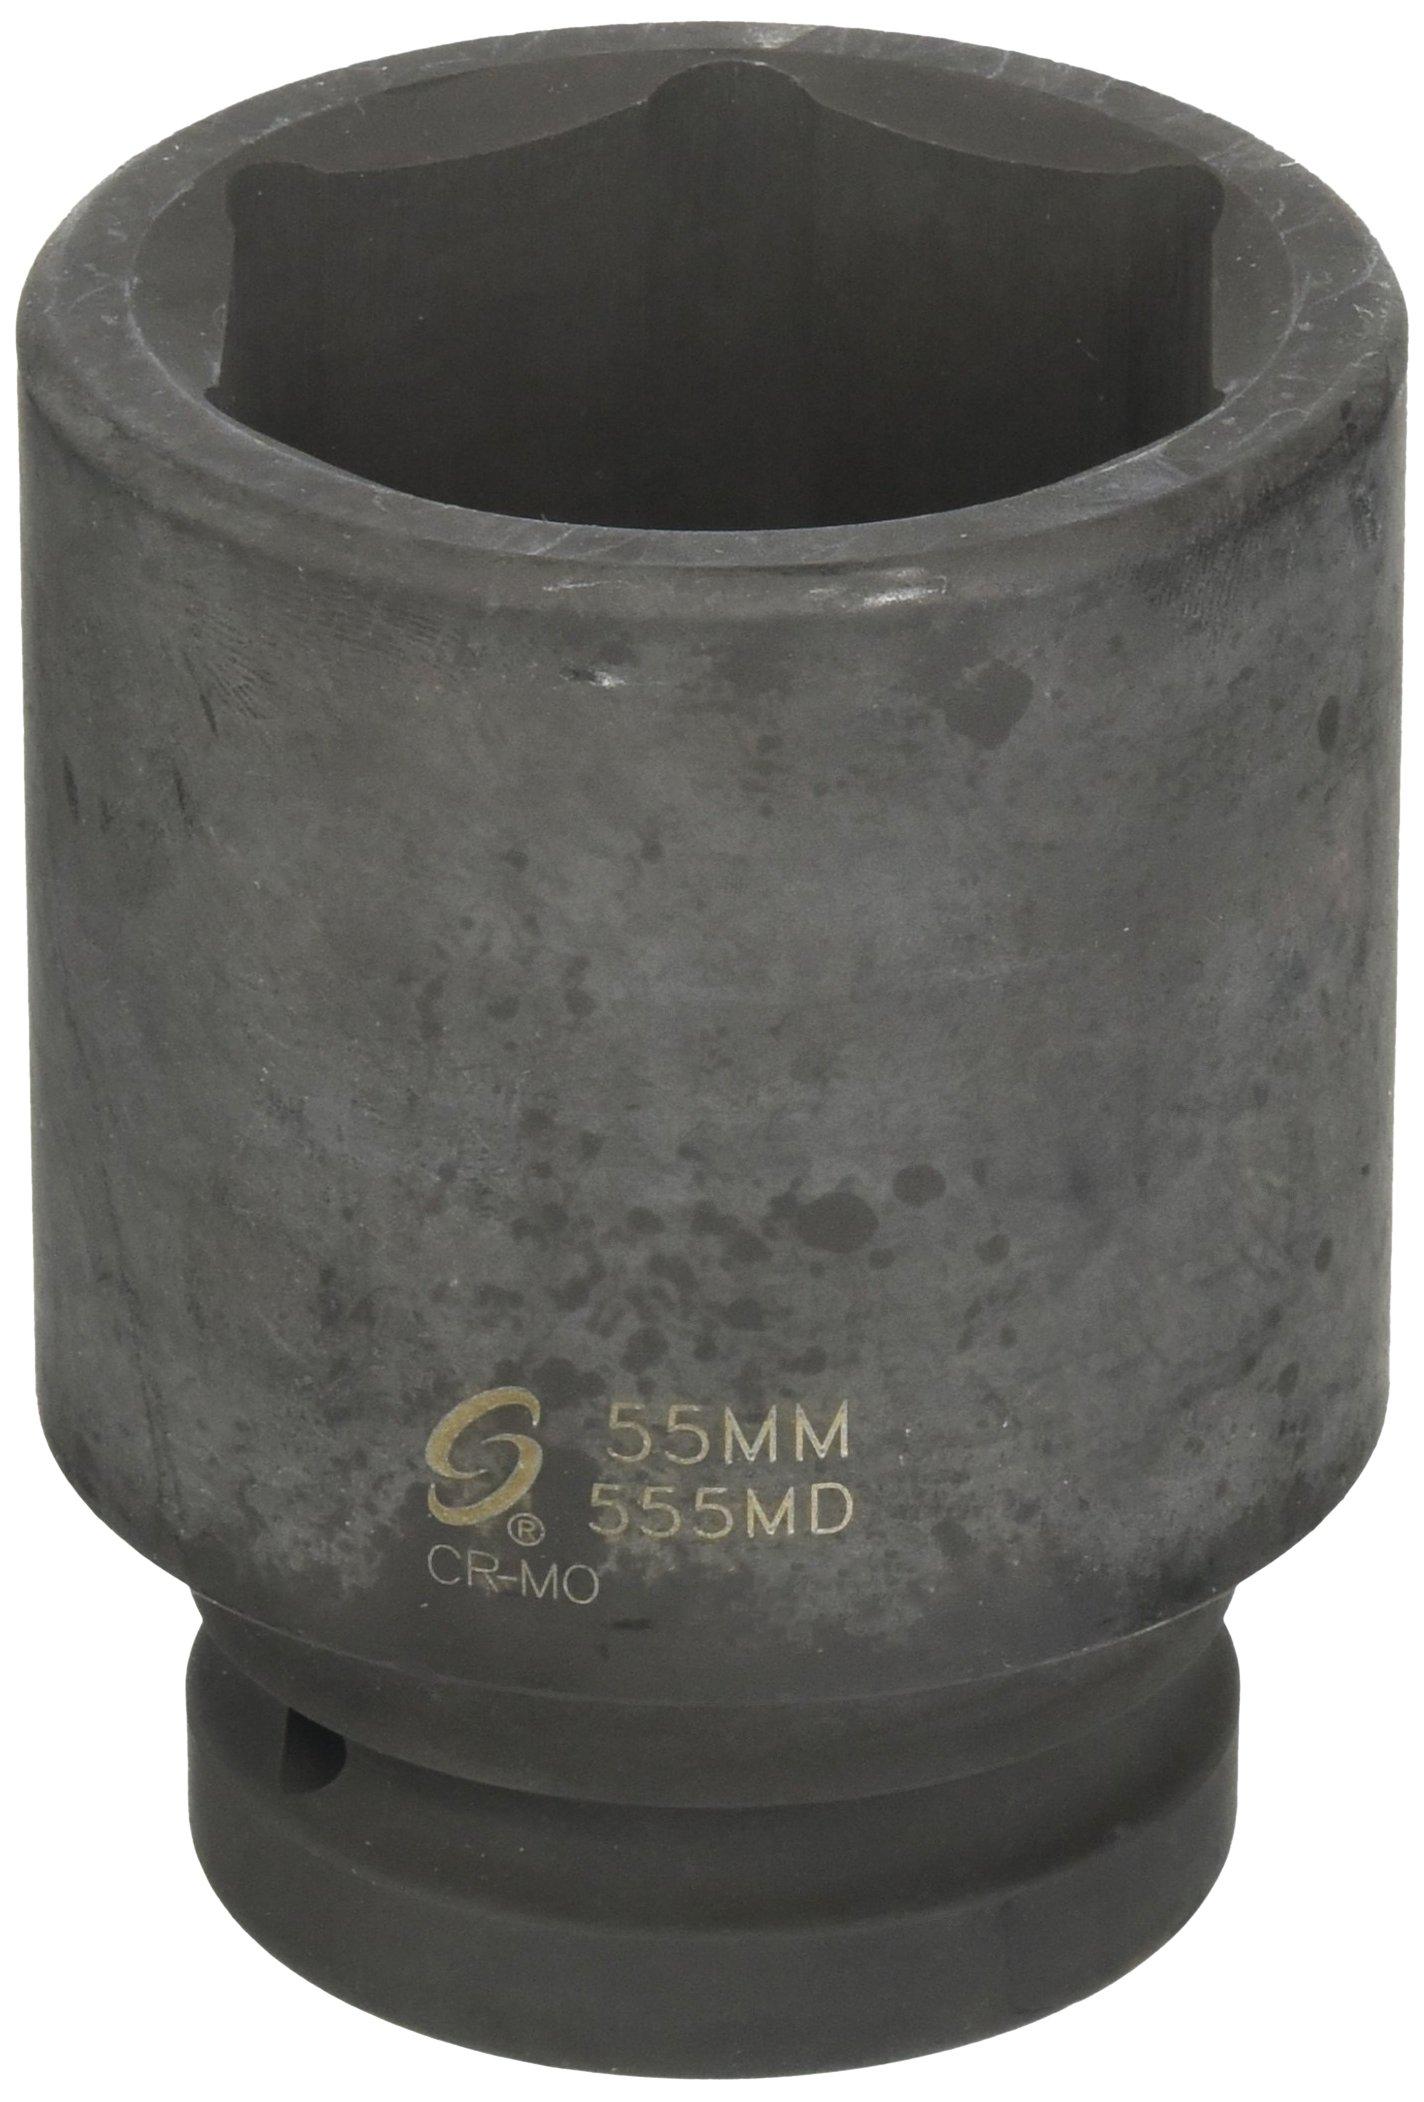 Big Roc IDS155 Air Deep Impact Socket 1'' X55Mmx110L Chrome Molybdenum/Card